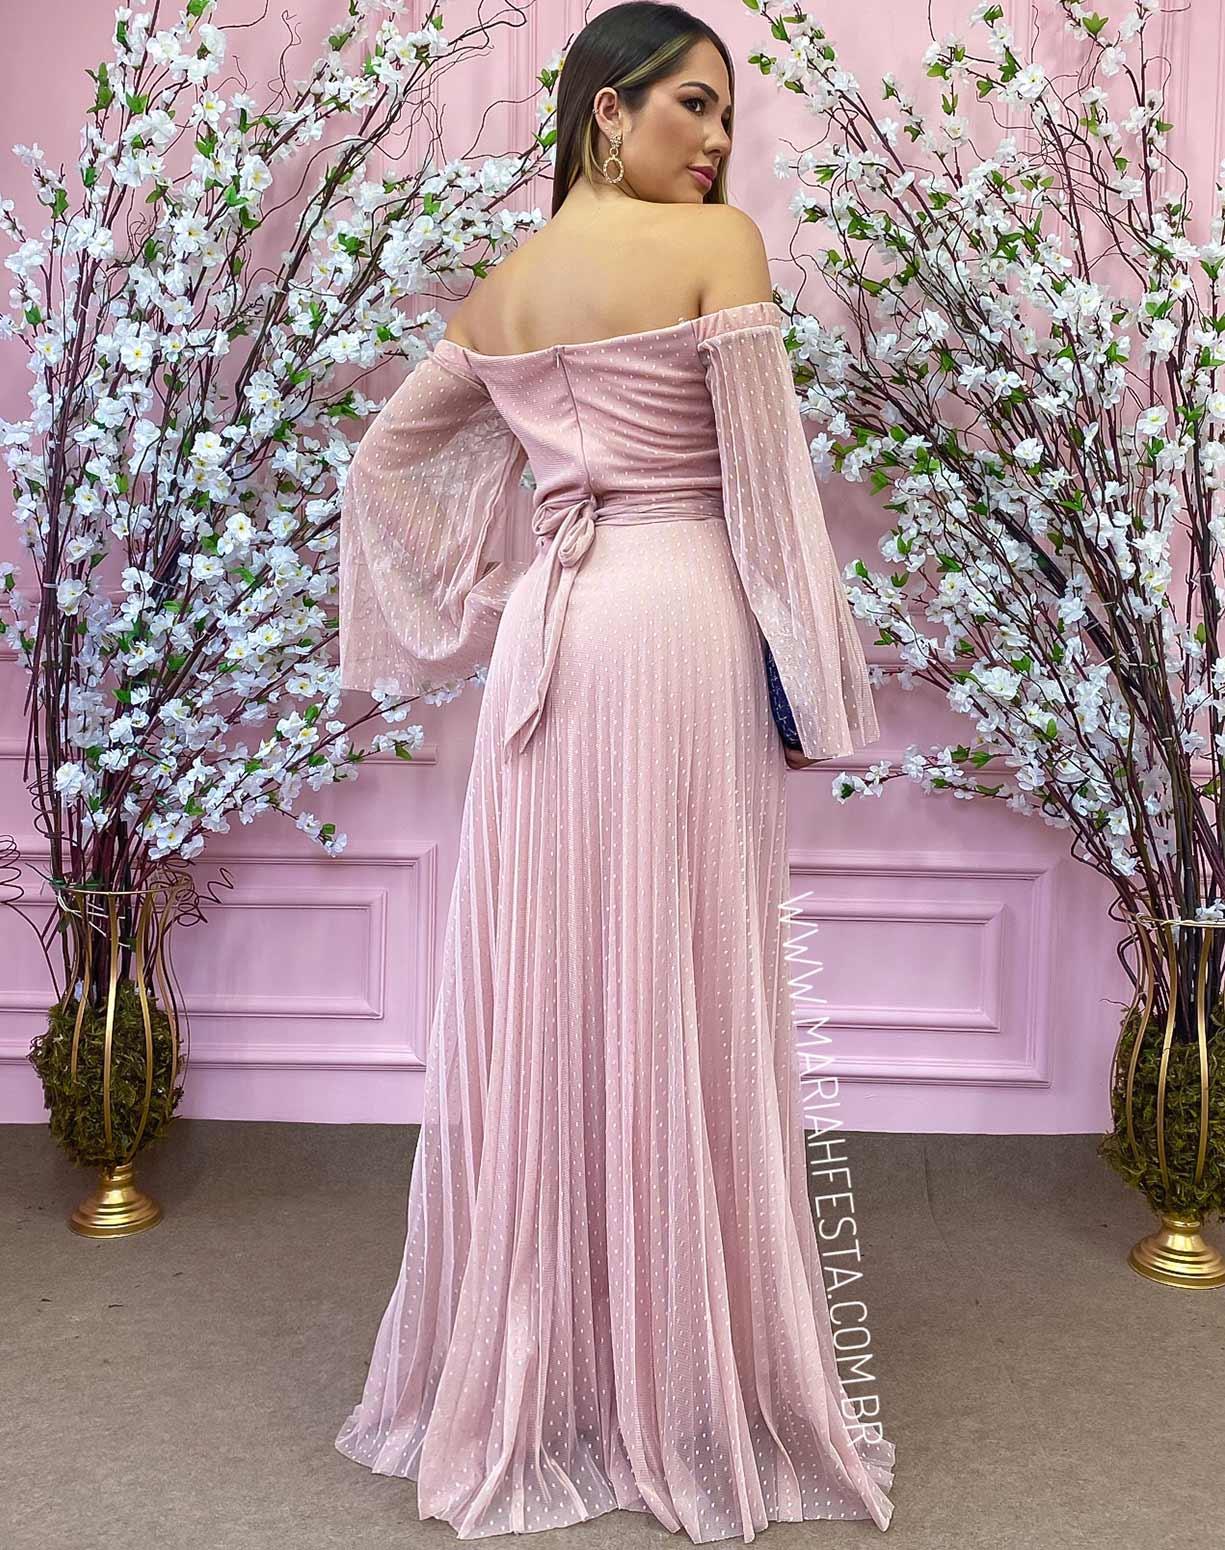 Vestido Rosê Ombro a Ombro em Tule Texturizado